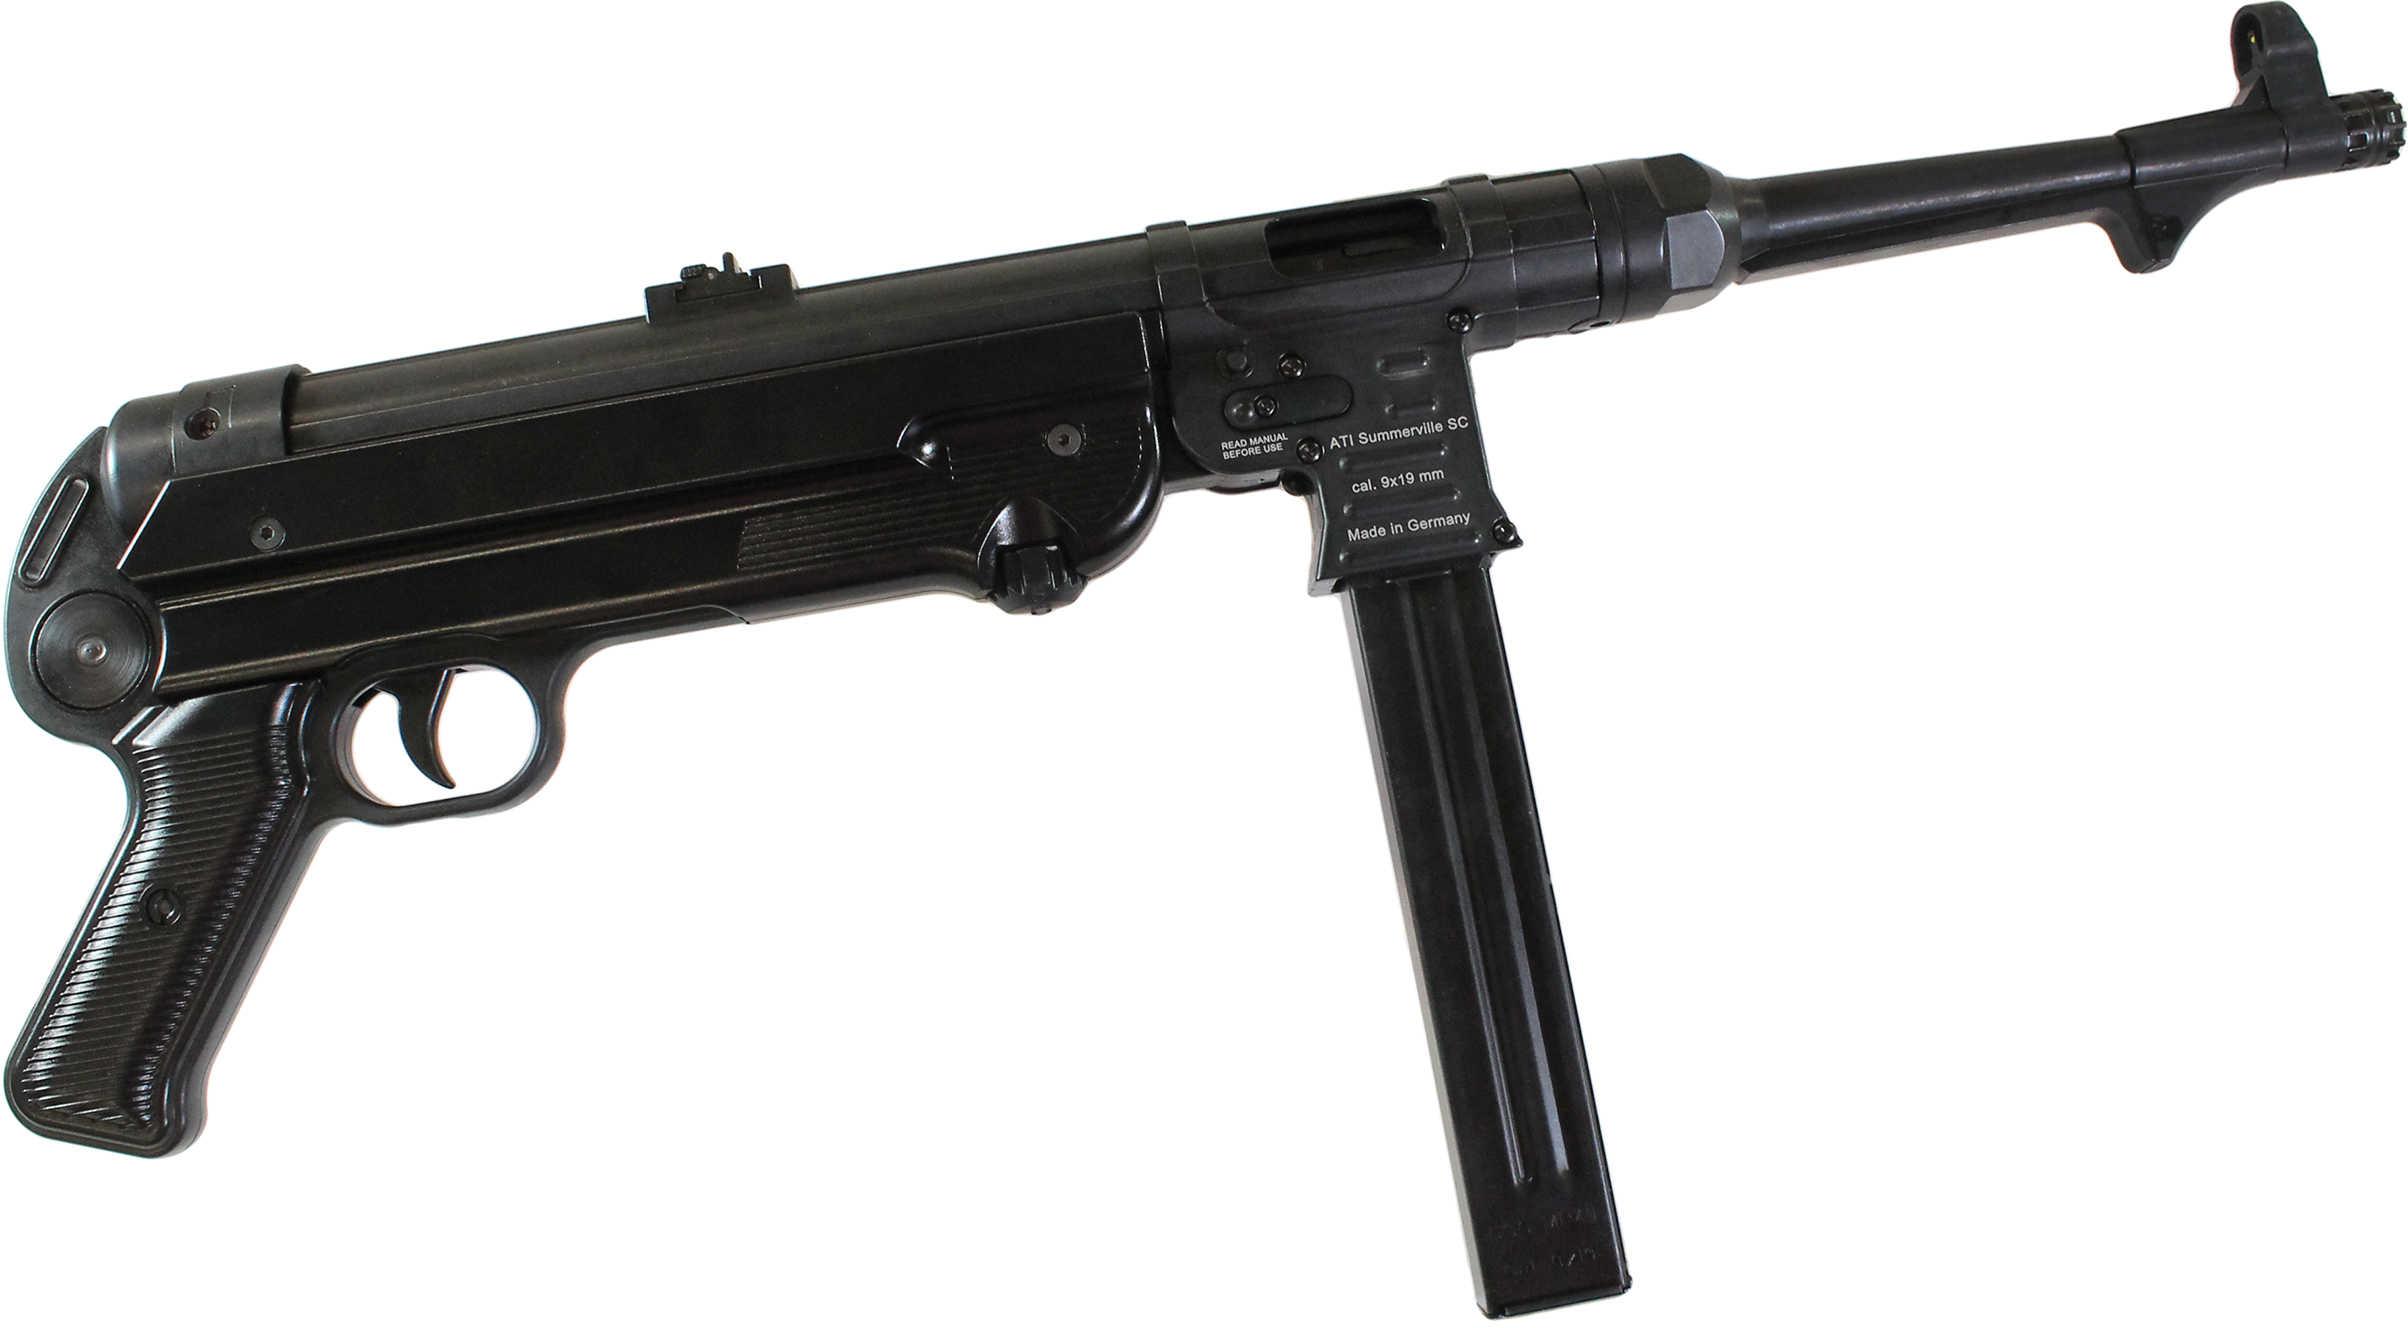 Pistol American Tactical Imports GSG-MP40P 9mm 10.8'' Barrel 25 Round Blak Finish